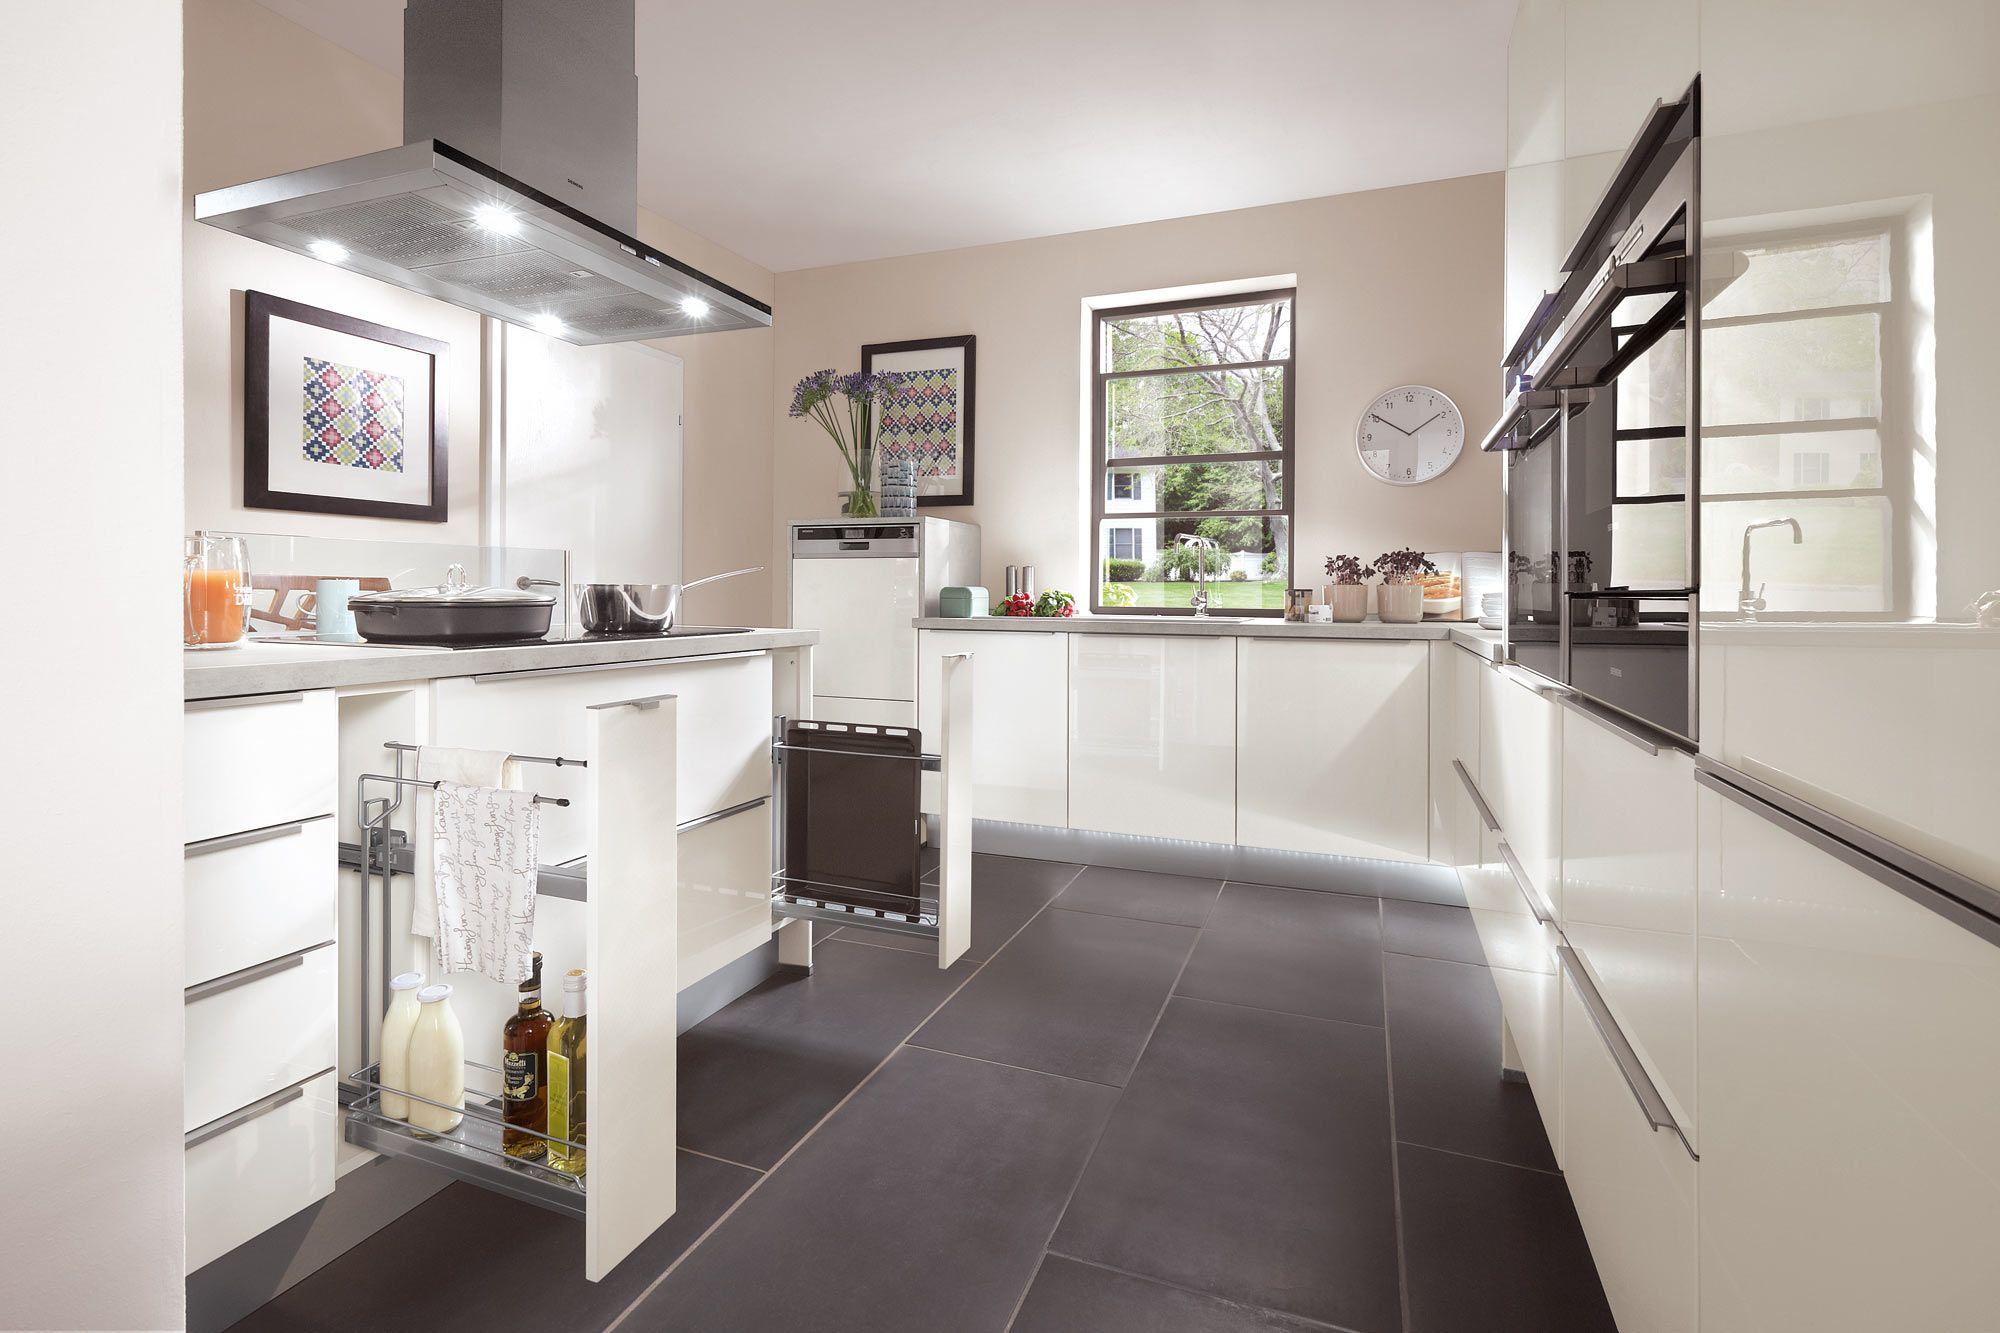 apothekerschrank norina9555 einbauk che wei hochglanz lack k che pinterest einbauk che. Black Bedroom Furniture Sets. Home Design Ideas